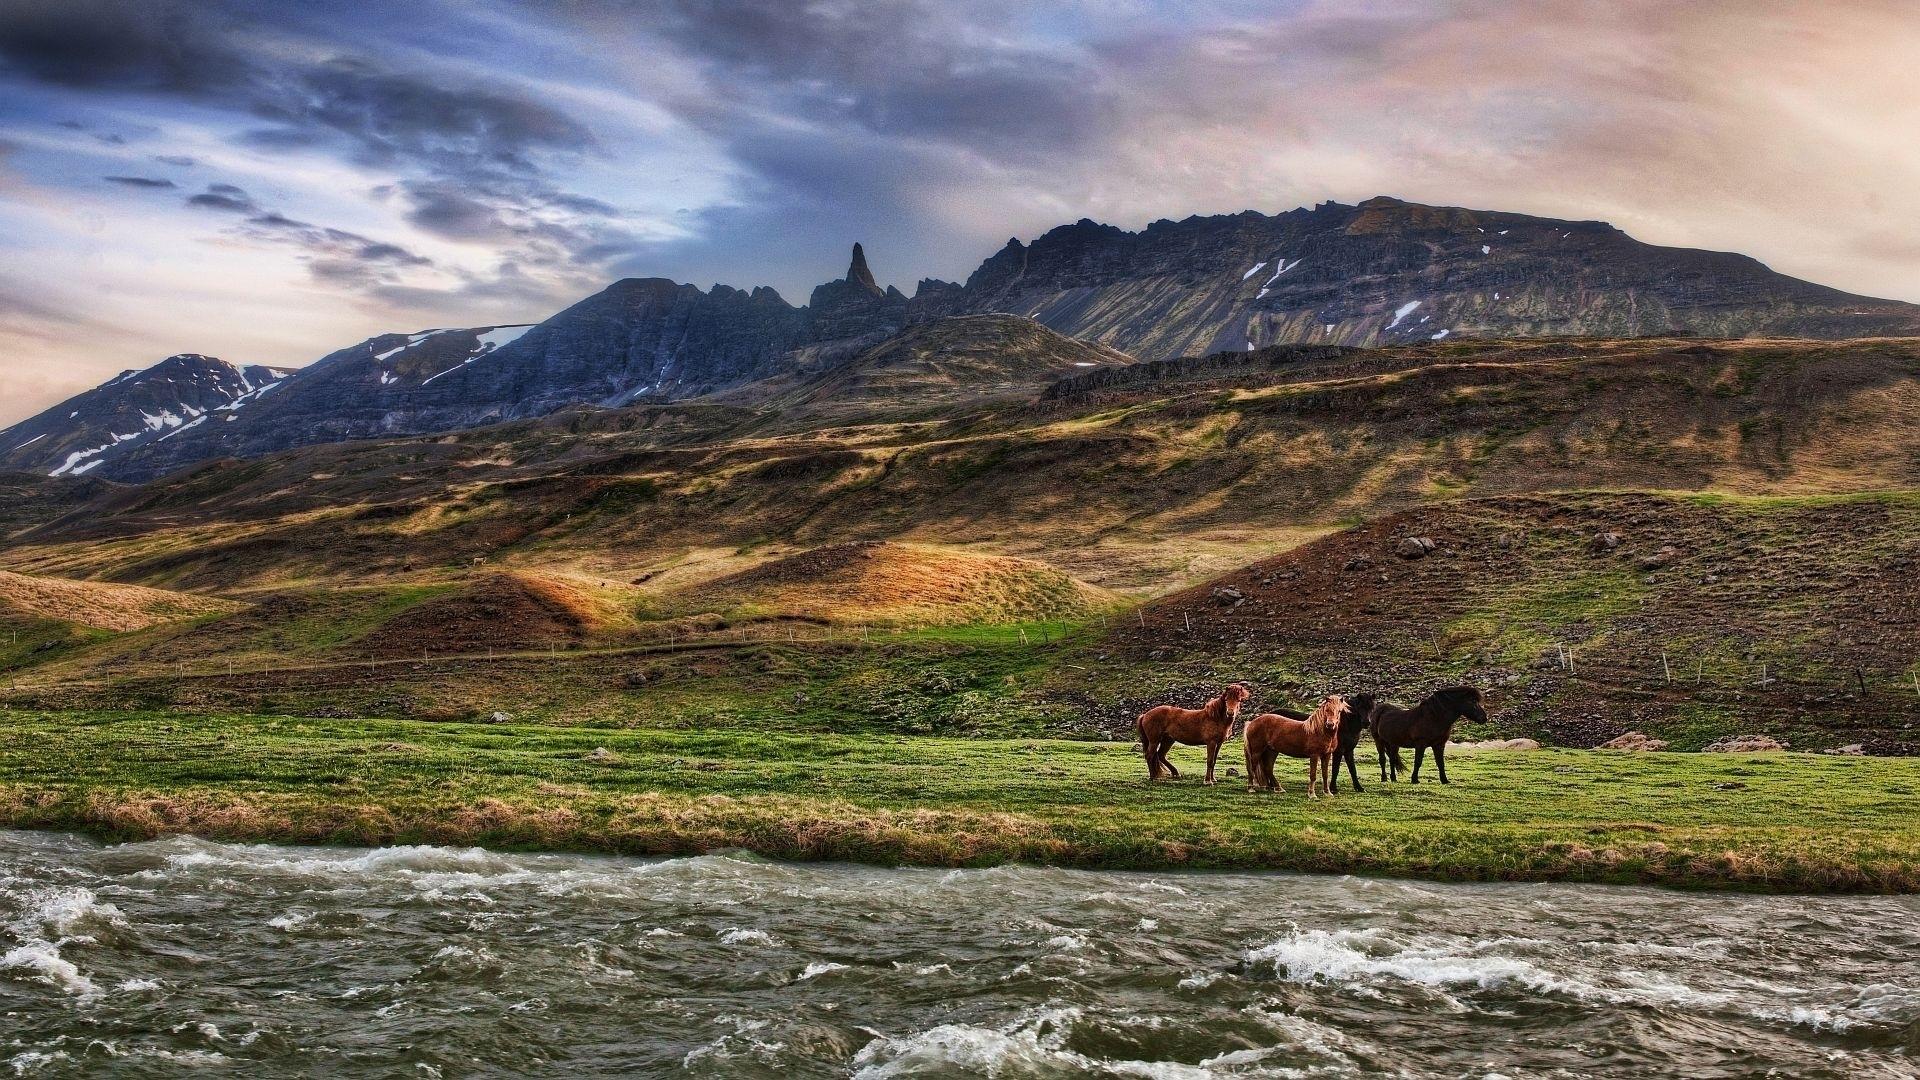 Mongolia Nature best background